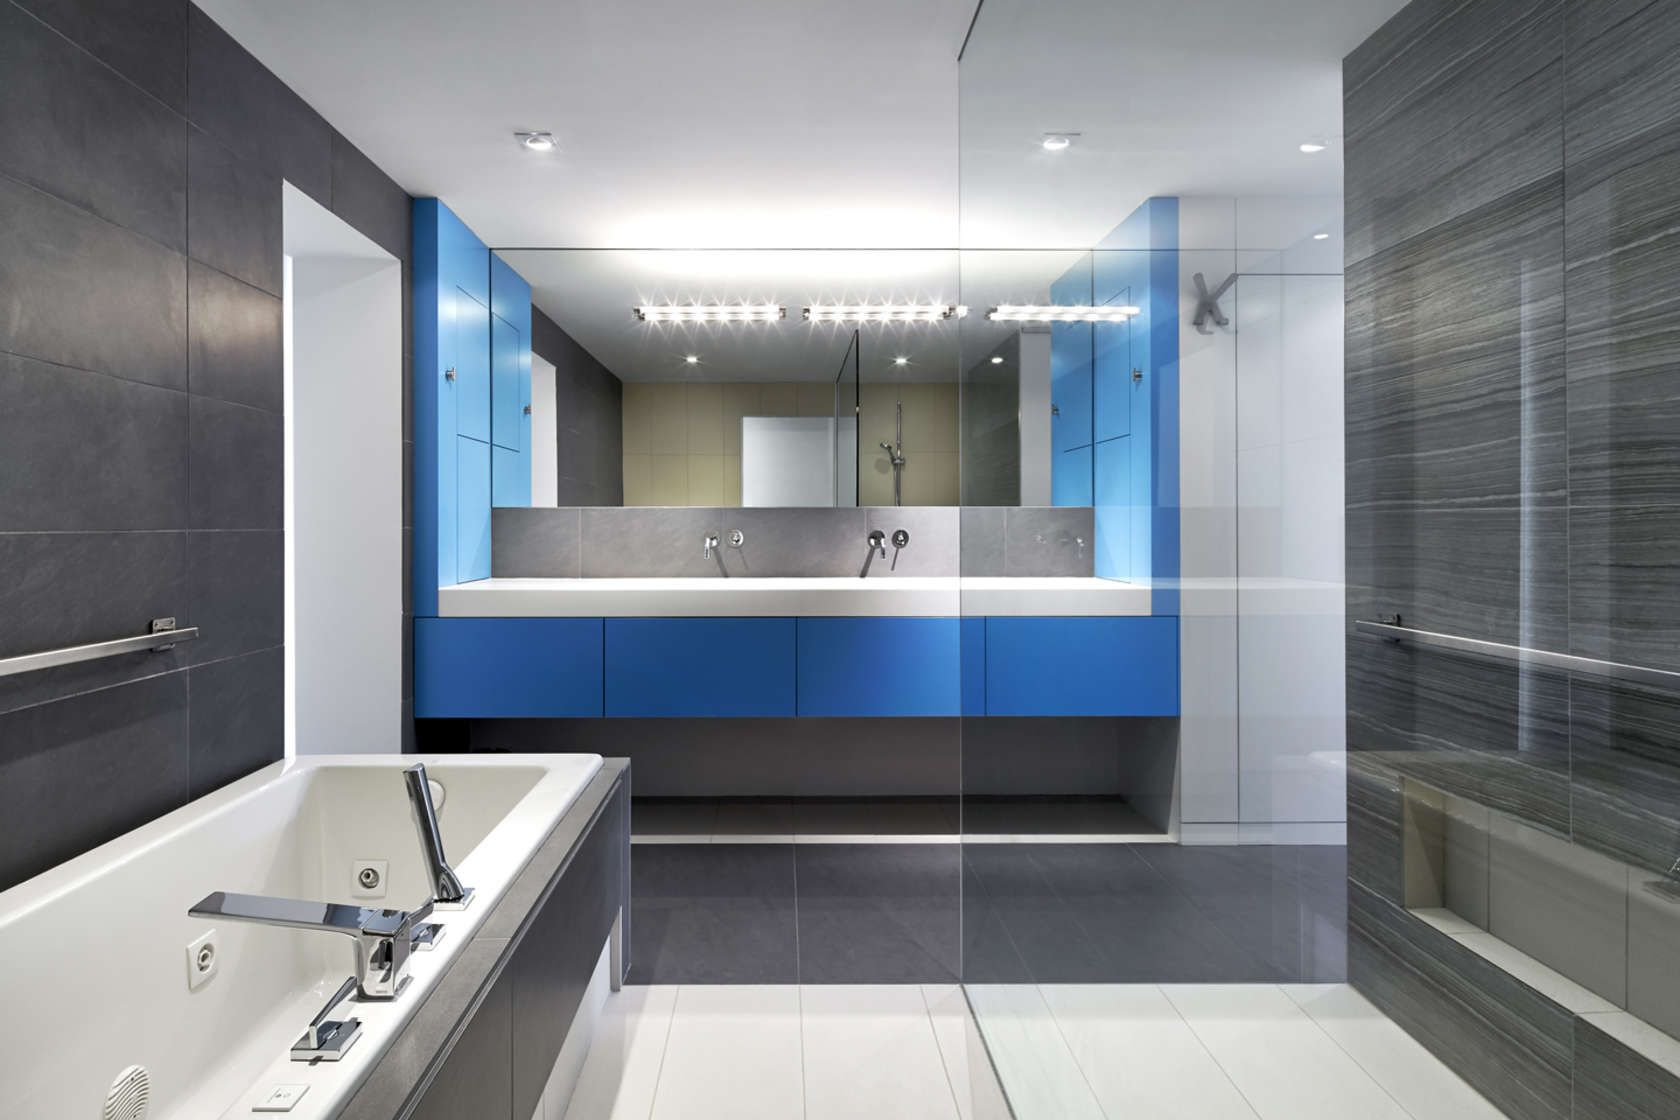 Bathroom:Luxury Bathtub Ideas For Bathroom Decor Light Bath Bar ...